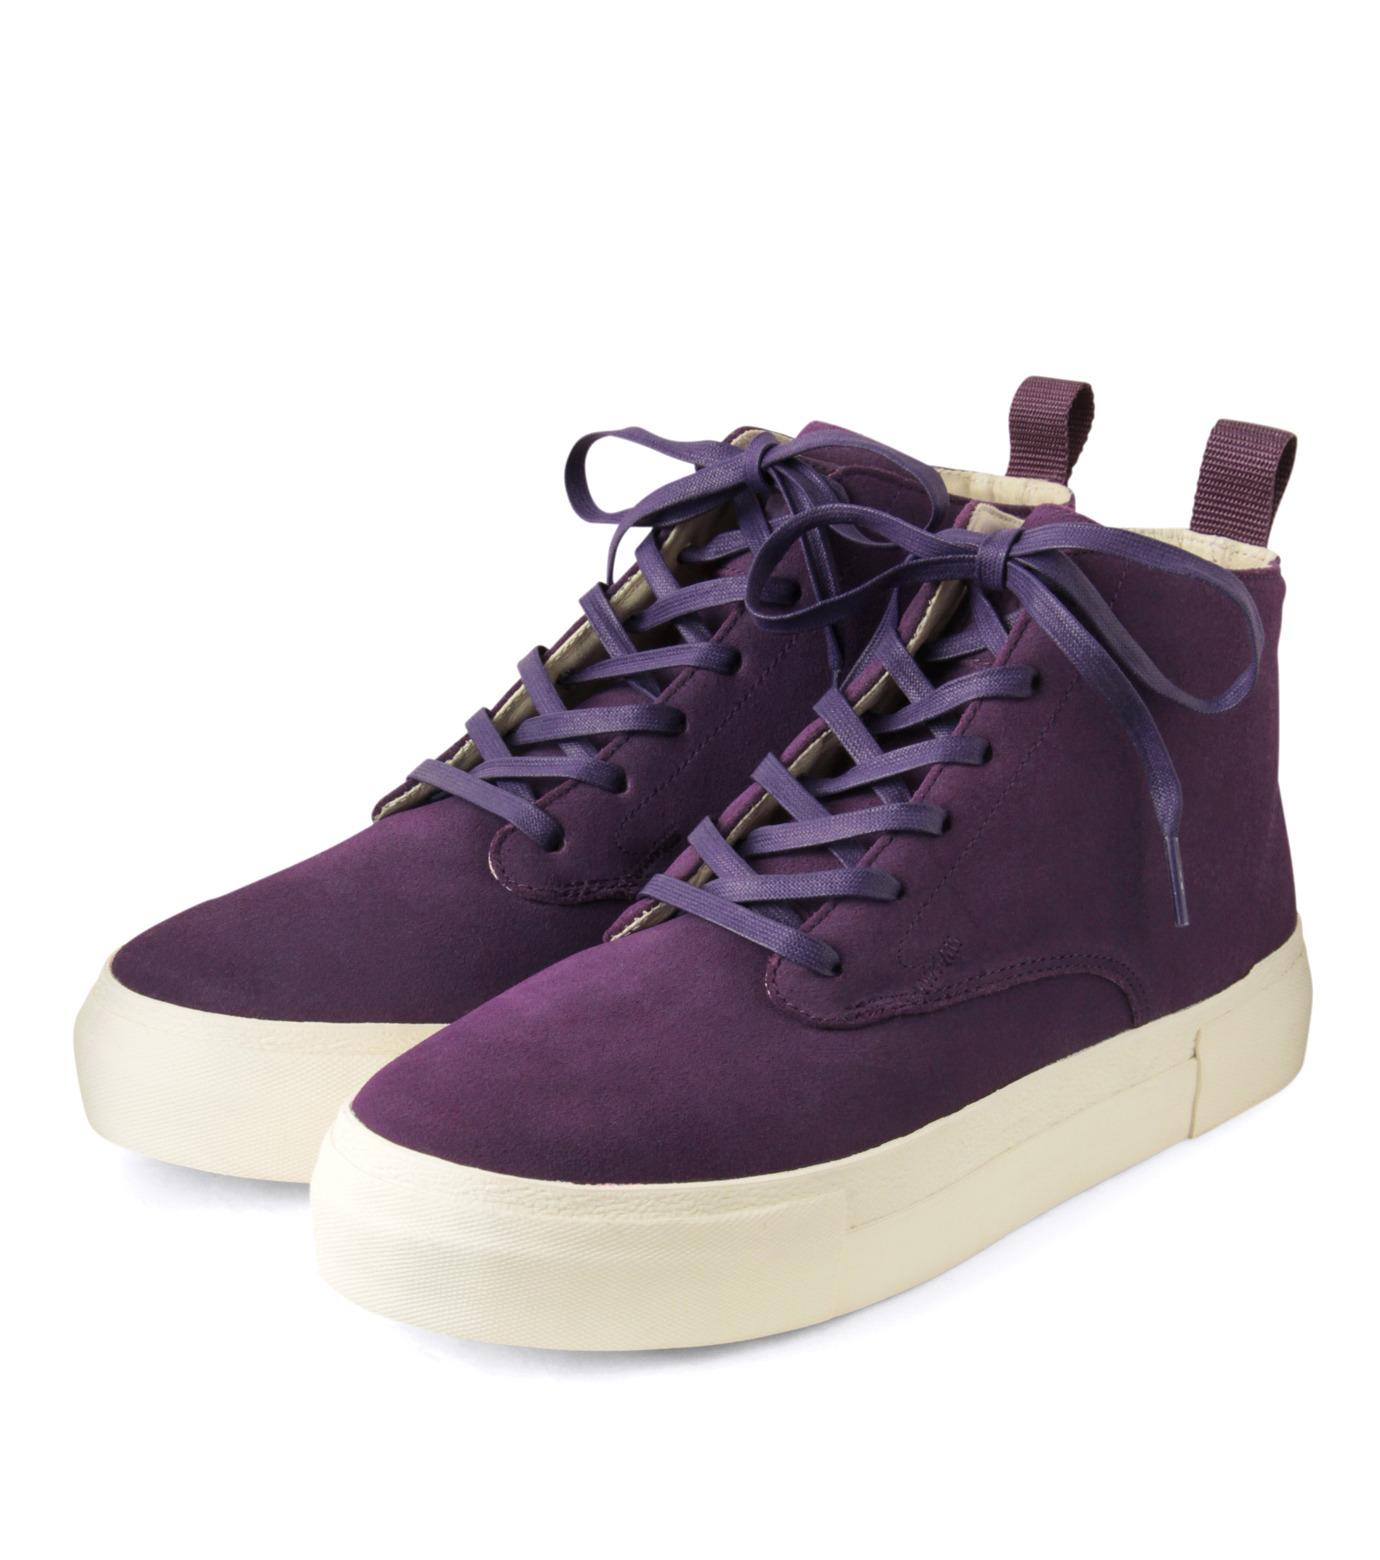 Eytys(エイティーズ)のSuedeHicutSneaker-PURPLE(スニーカー/sneaker)-ODYSSEY-SUE-82 拡大詳細画像4